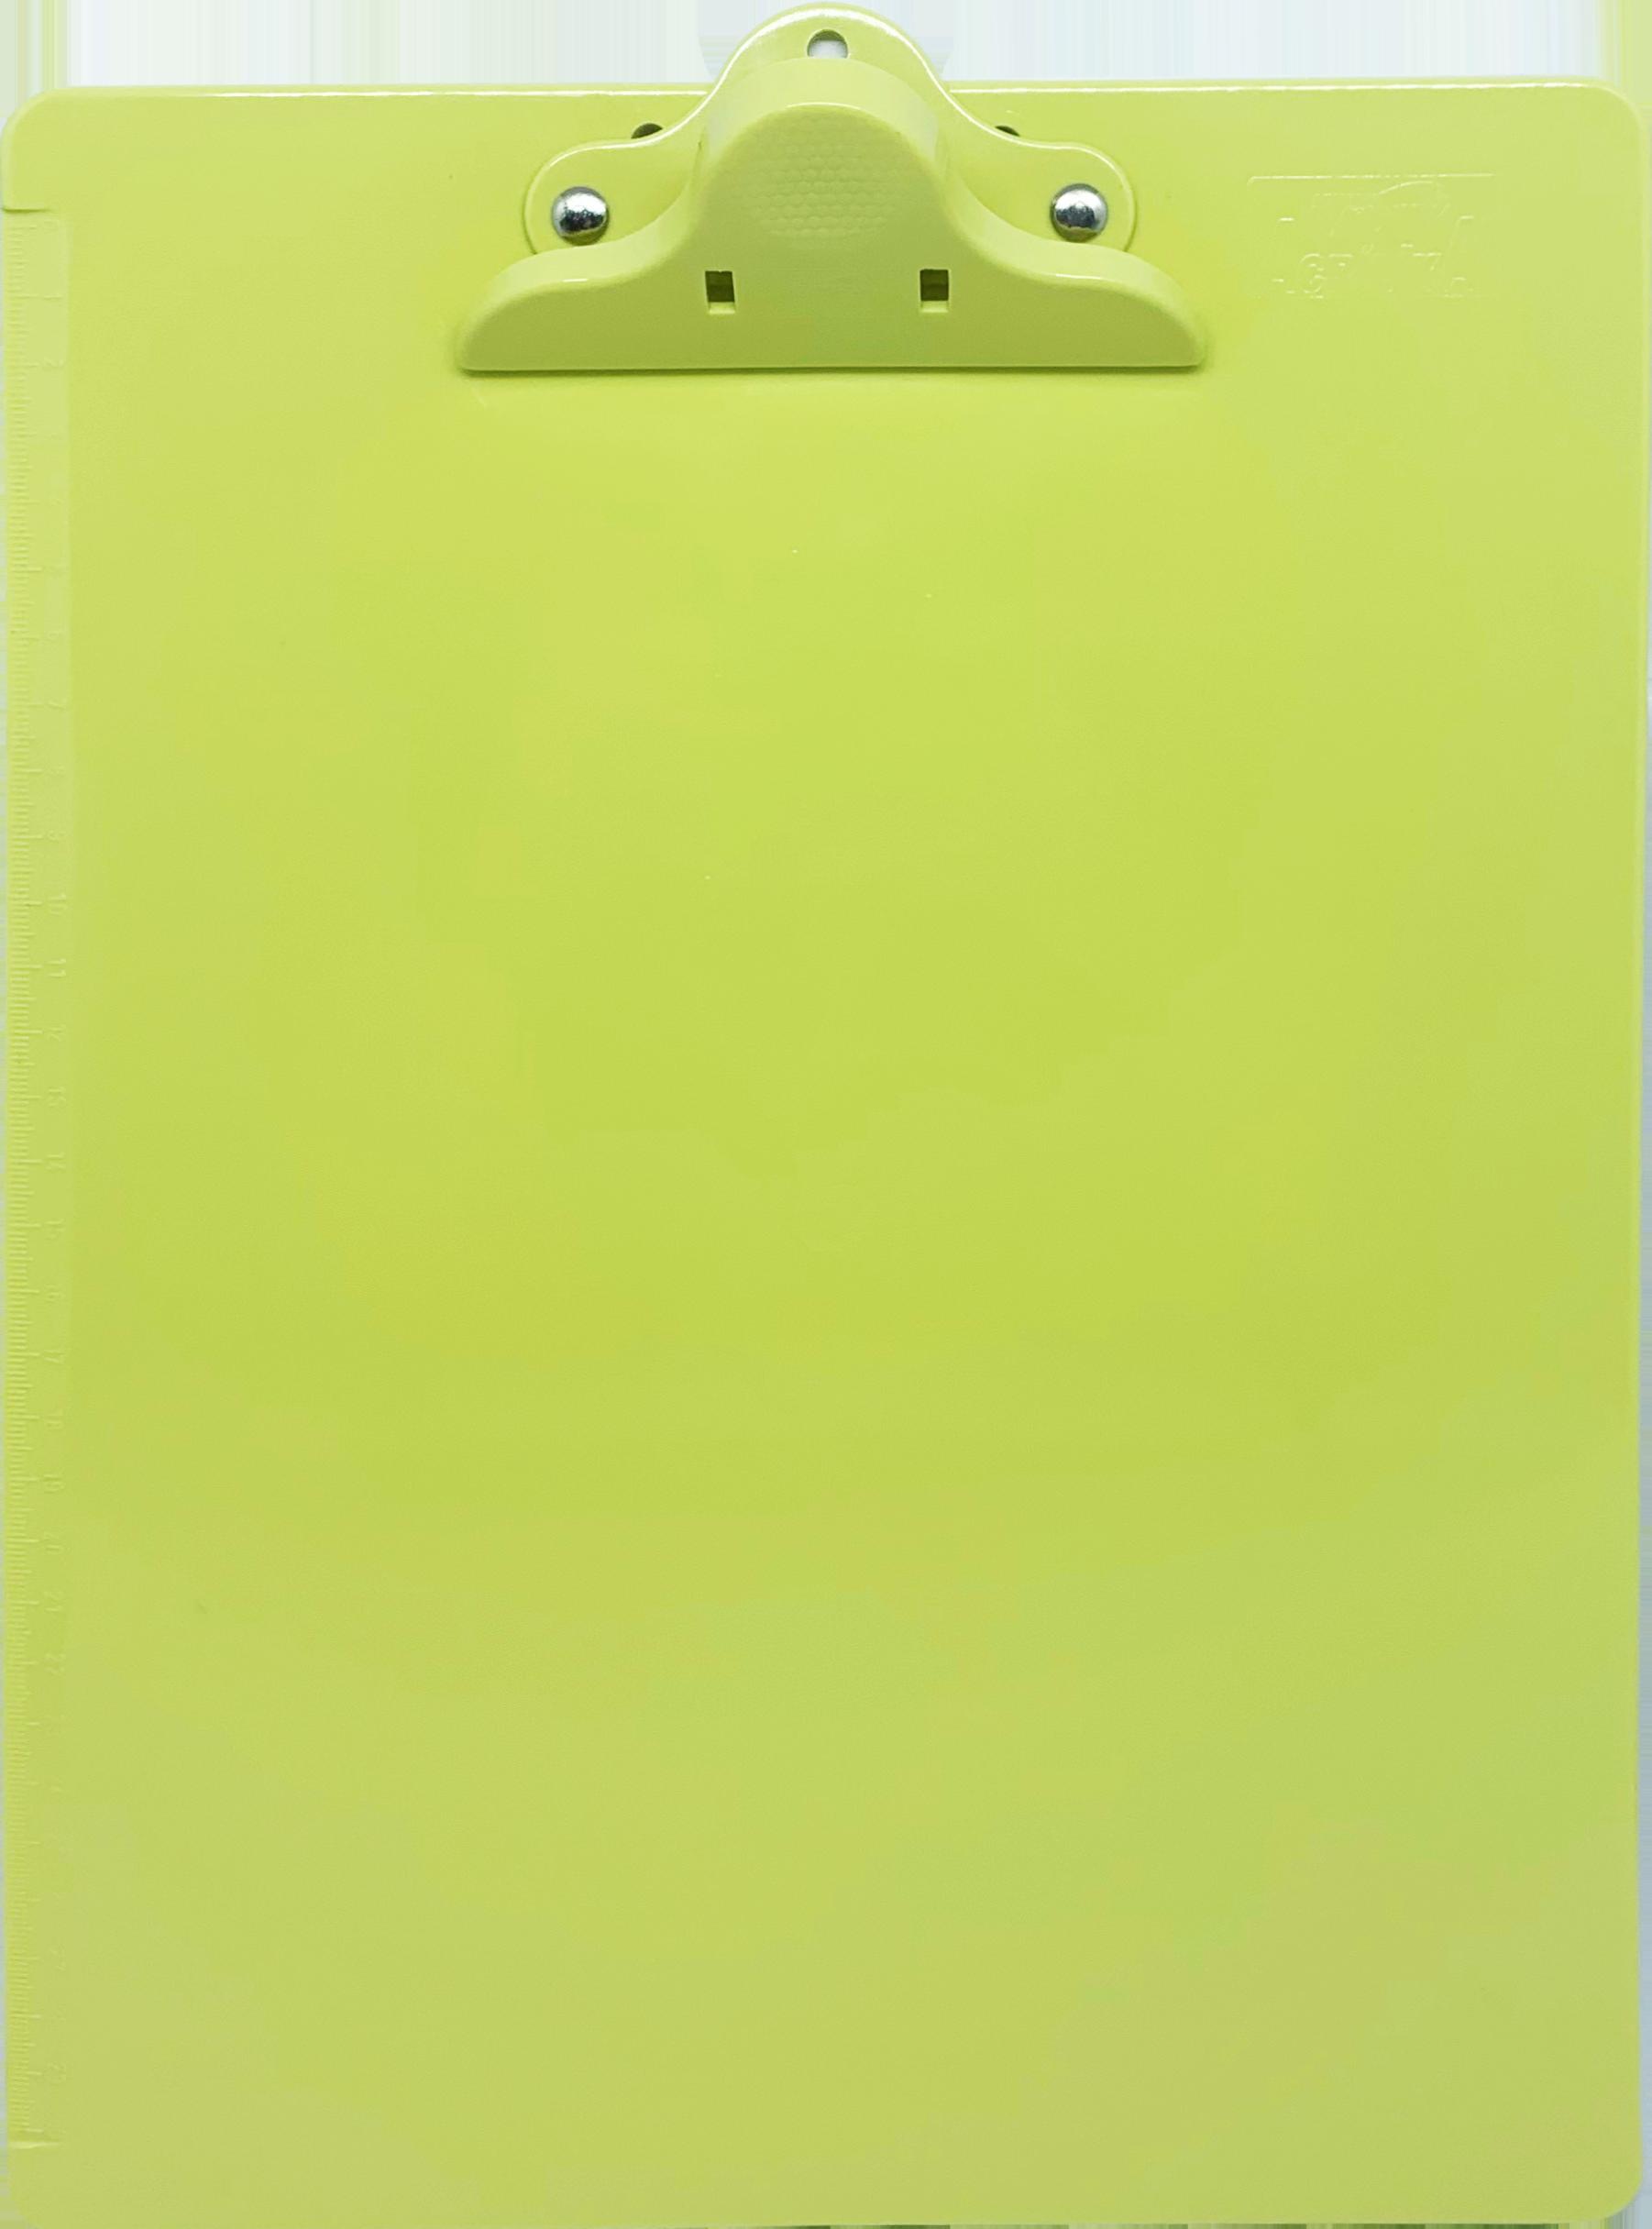 p_amarelo (2)